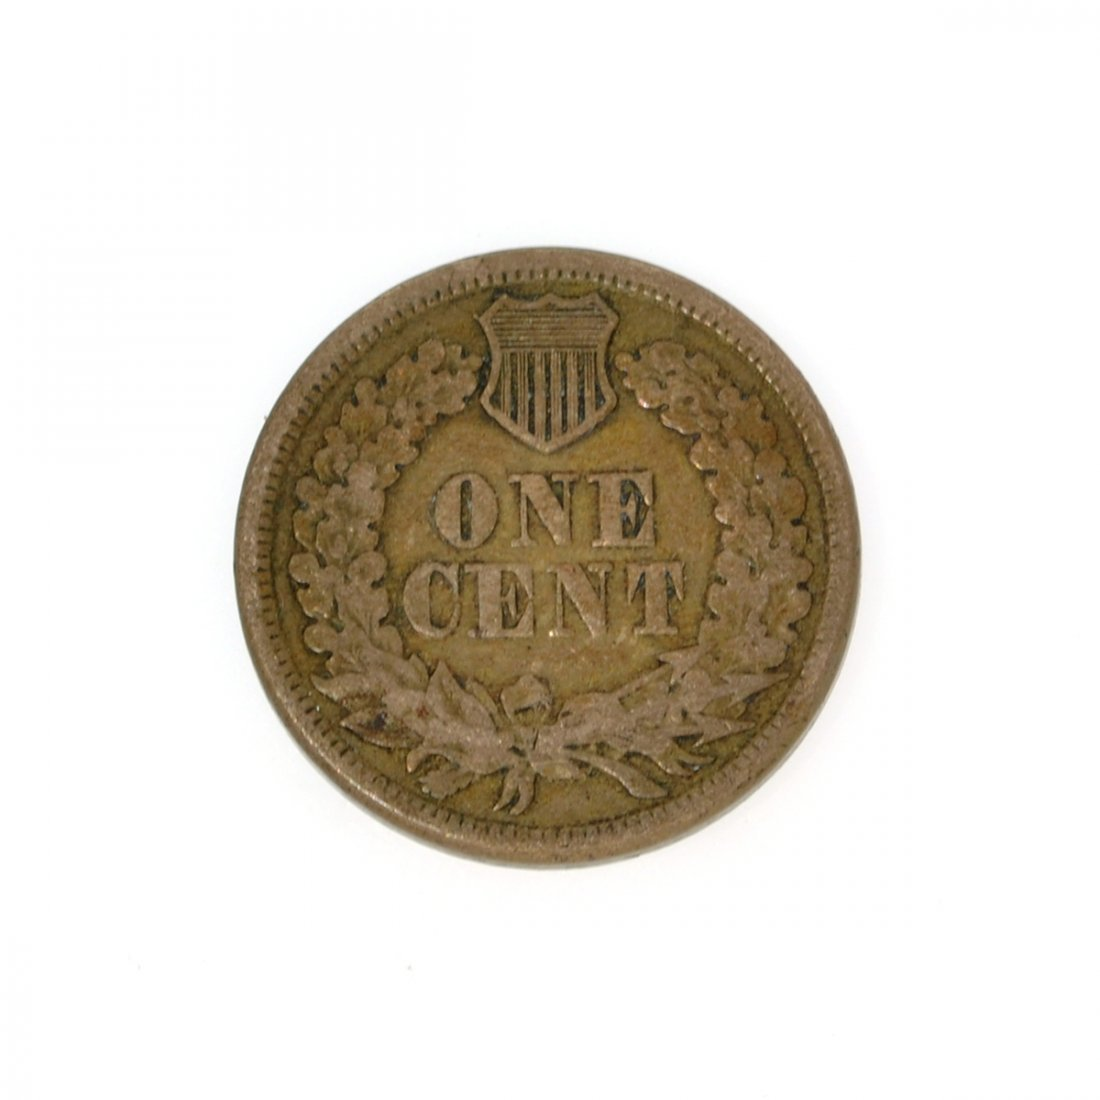 Rare 1862 Indian Cent Coin - 2